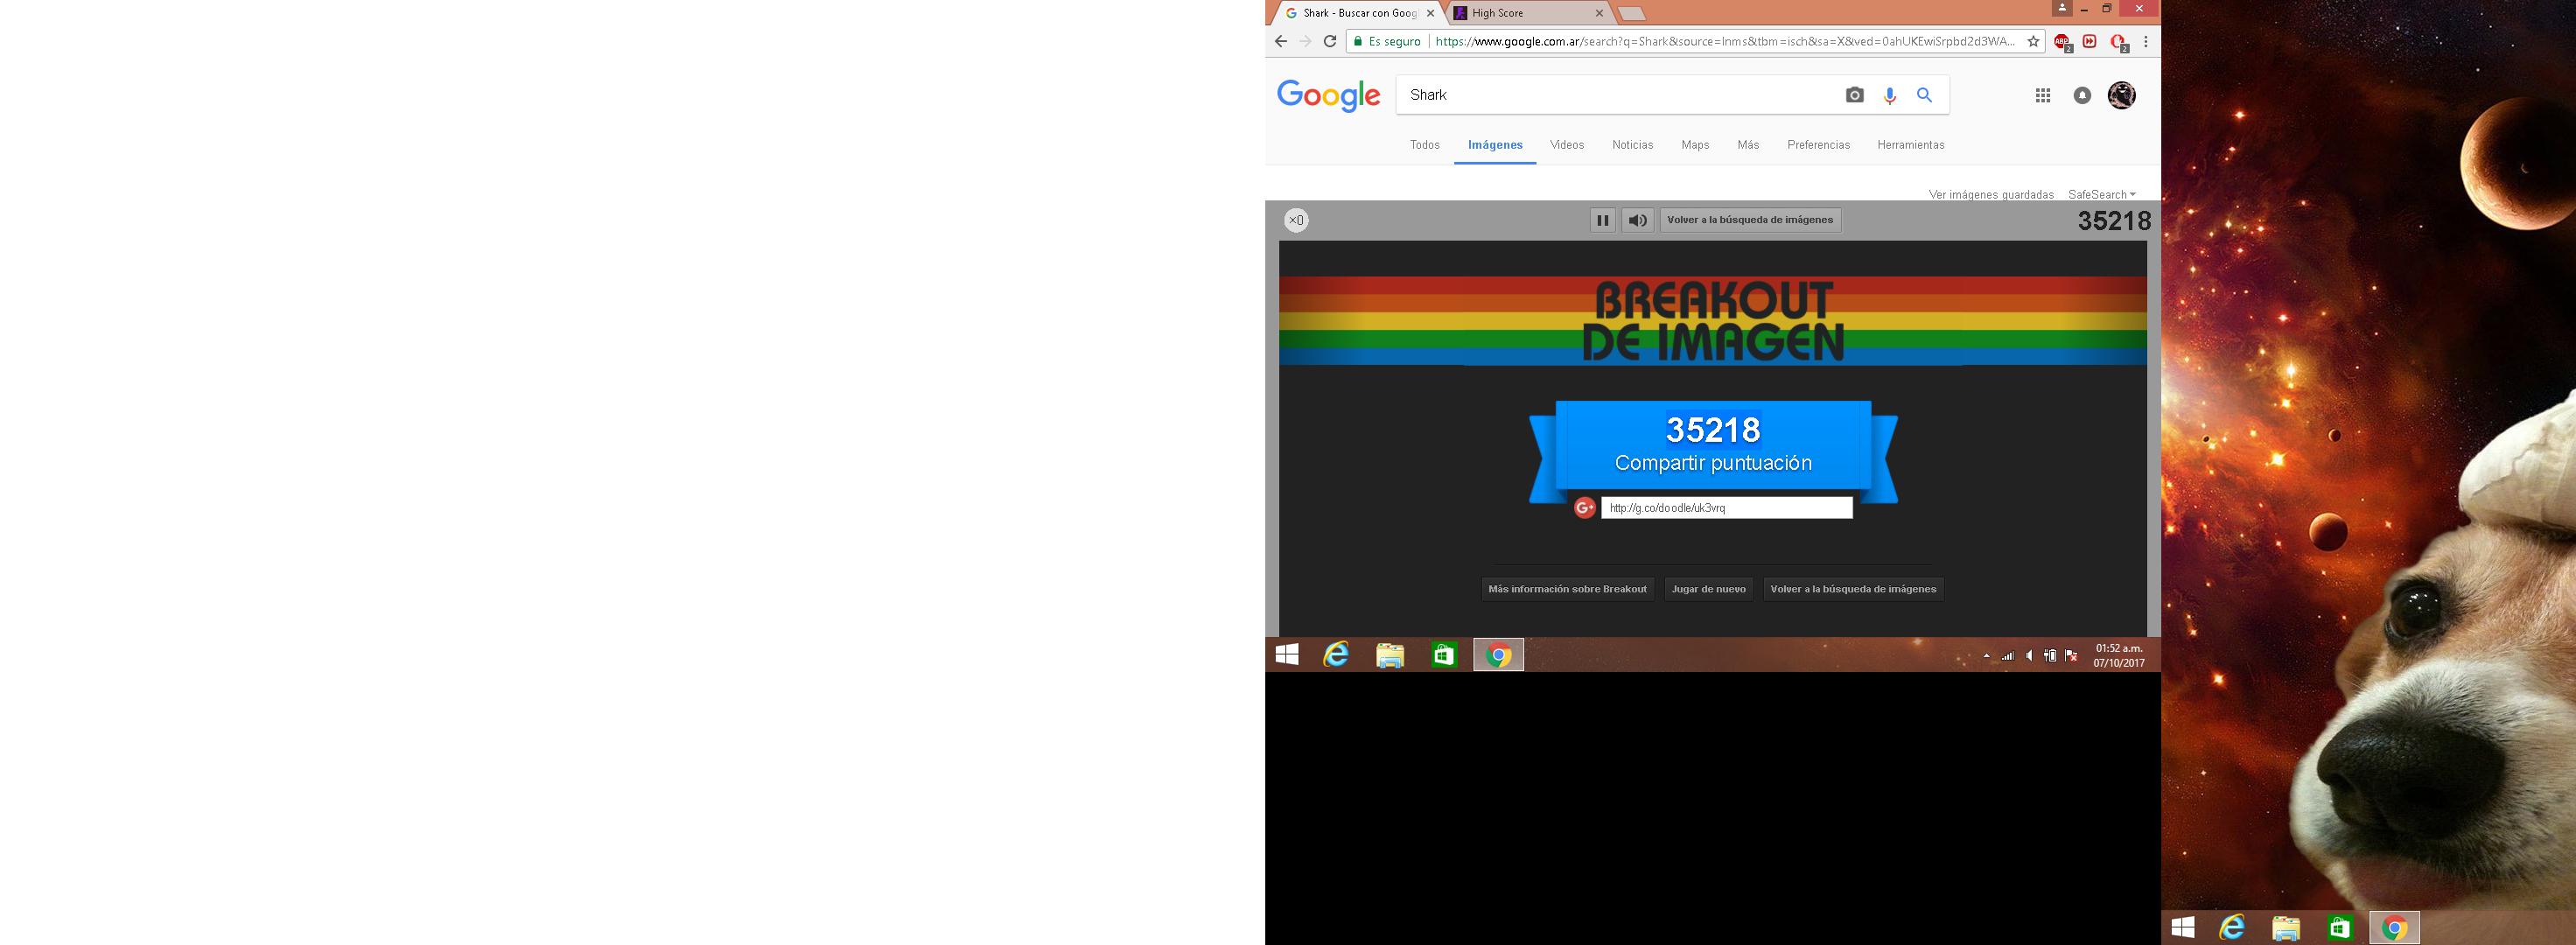 Google Image Breakout 35,218 points